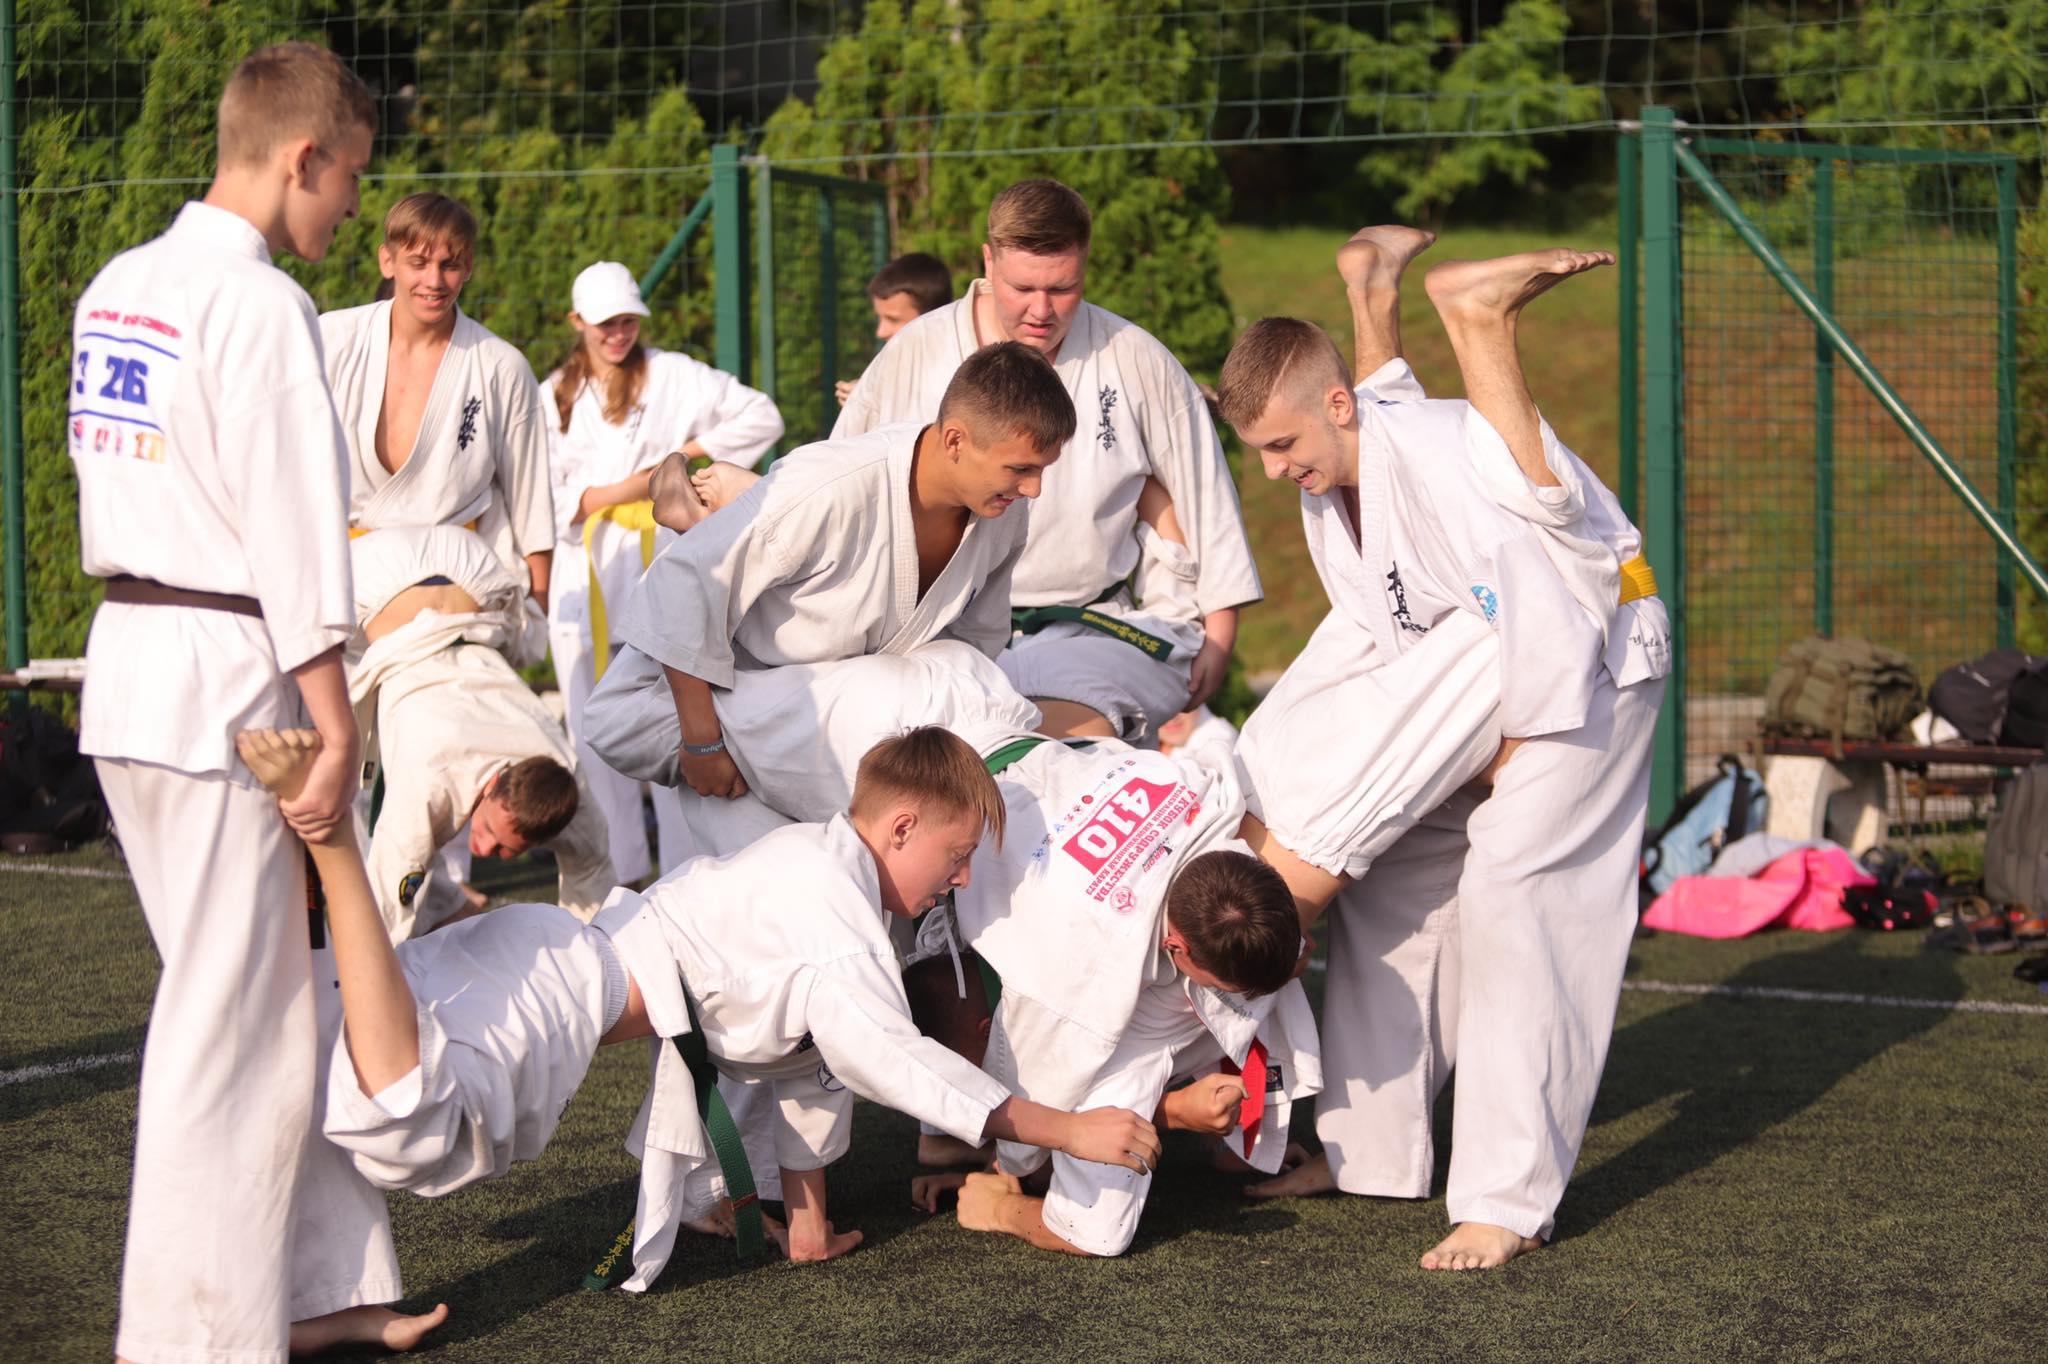 Игри и много смях в сутрешната тренировка по карате в Камчия